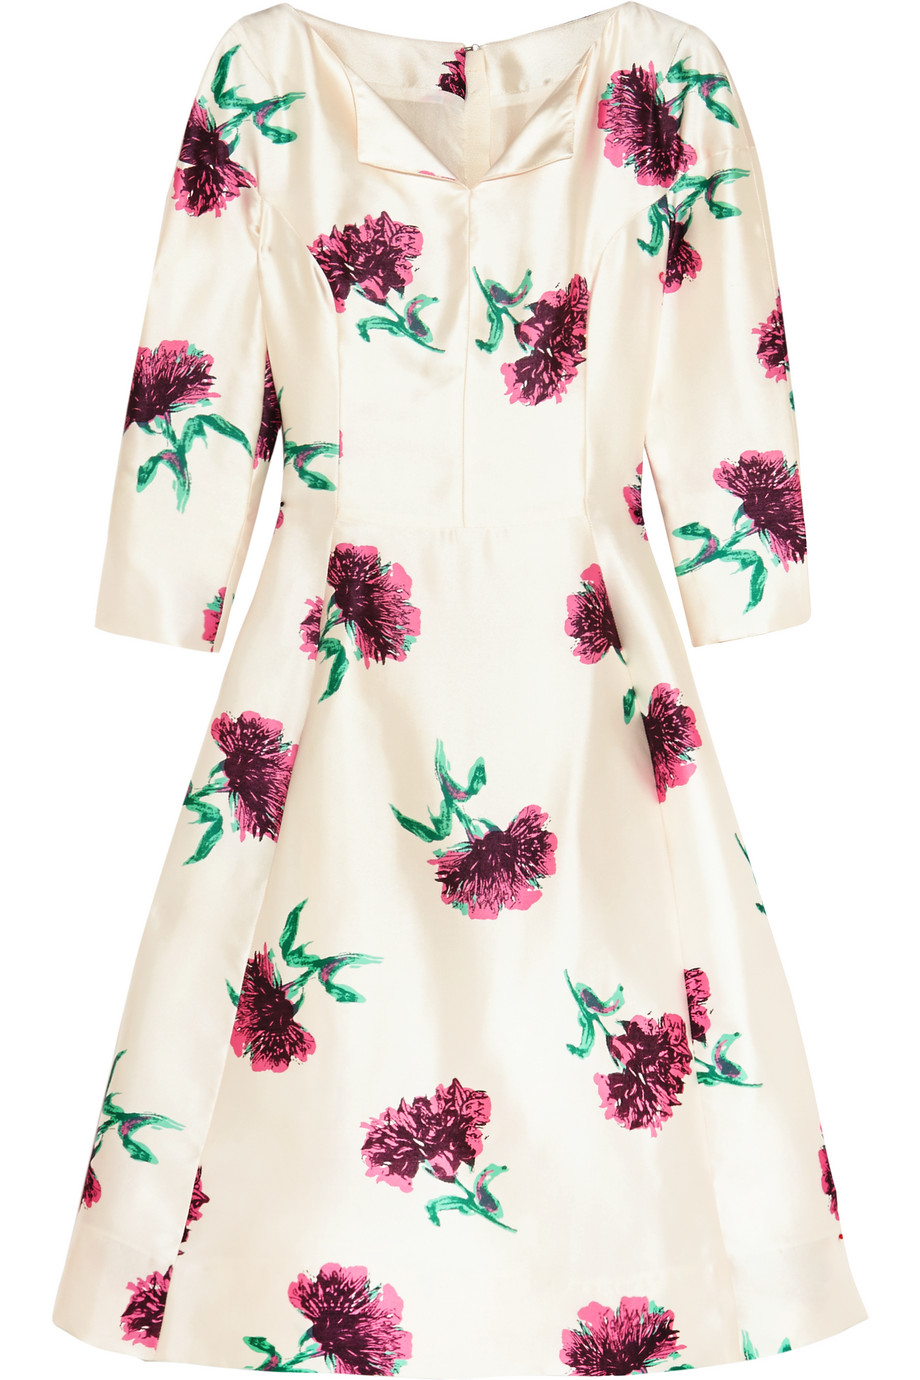 Oscar De La Renta Floral-Print Silk-Twill Dress, Ivory/Magenta, Women's - Printed, Size: 0